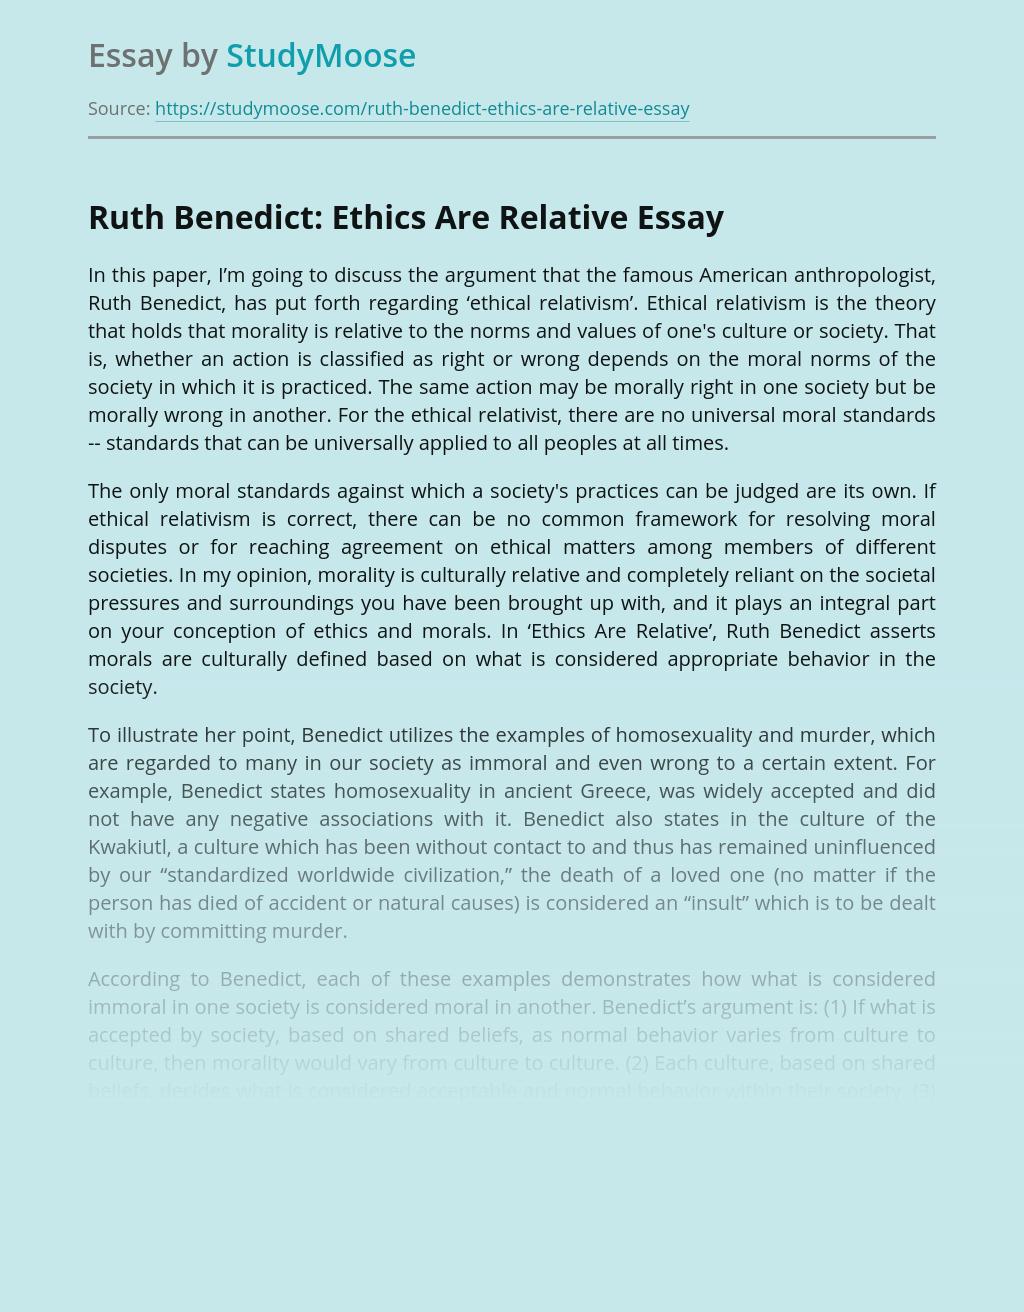 Ruth Benedict: Ethics Are Relative